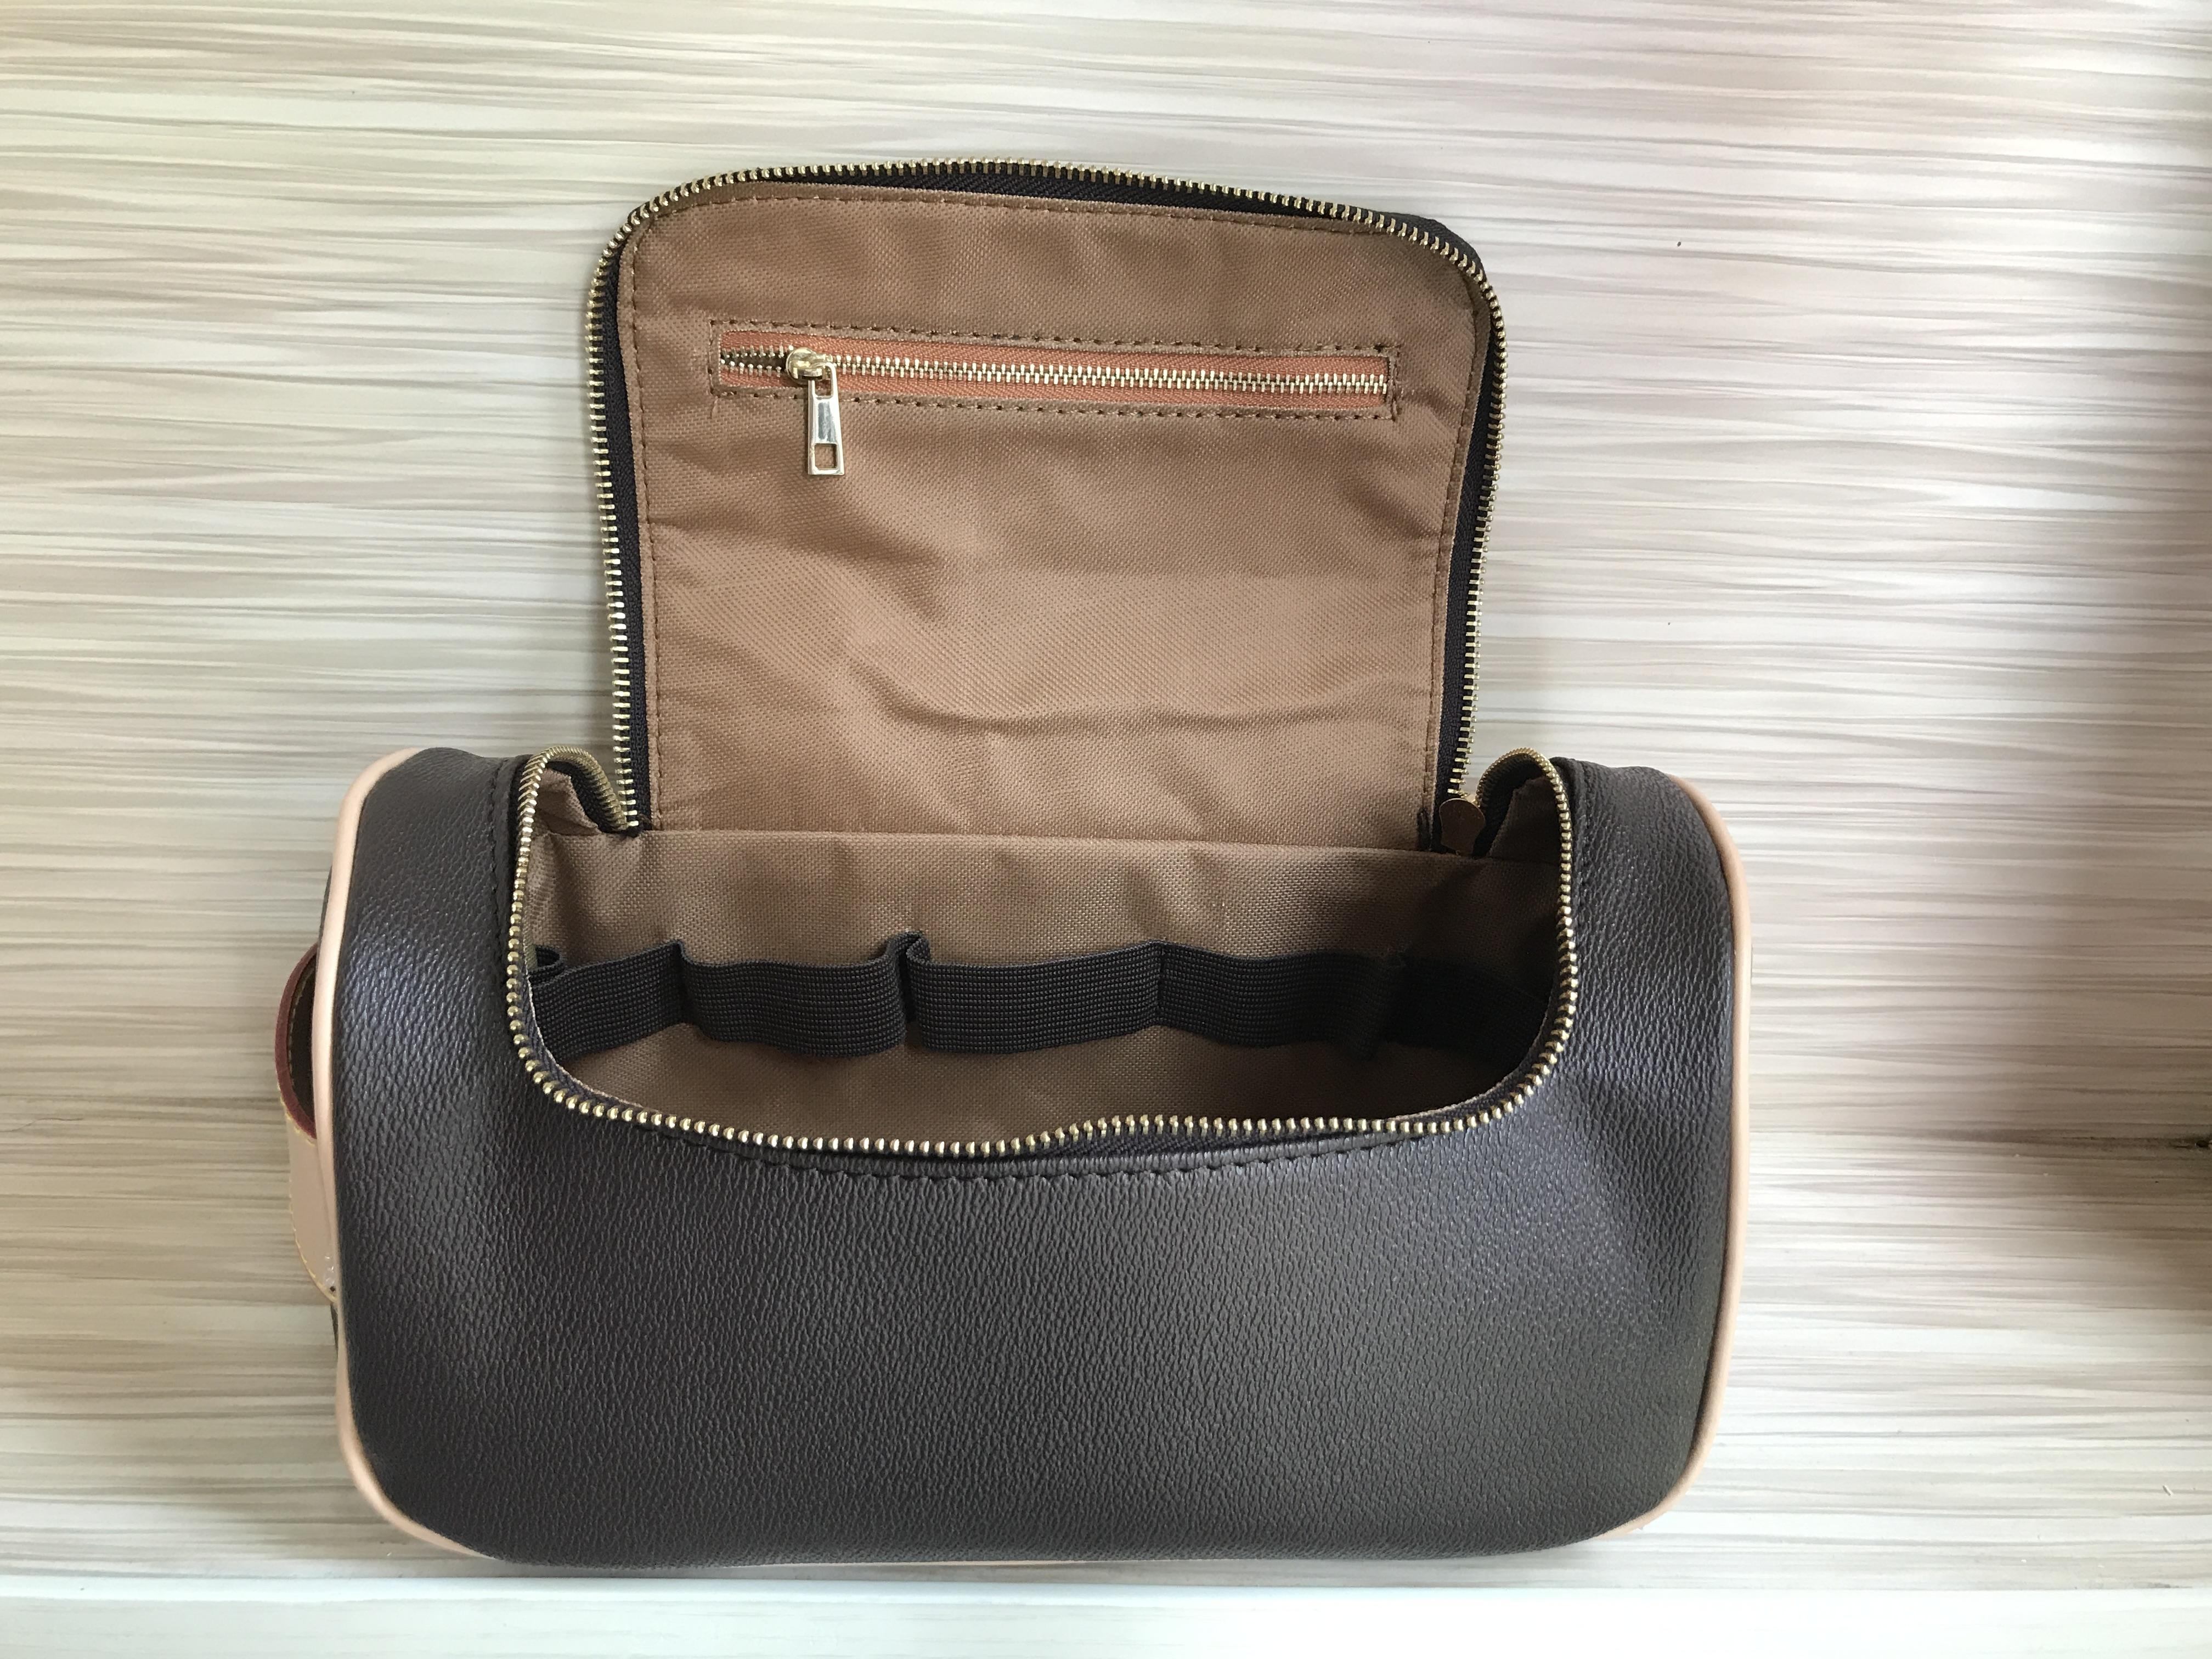 Designer Zipper Sacs cosmétiques cas sacs de maquillage de mode PU femmes cadeau en gros